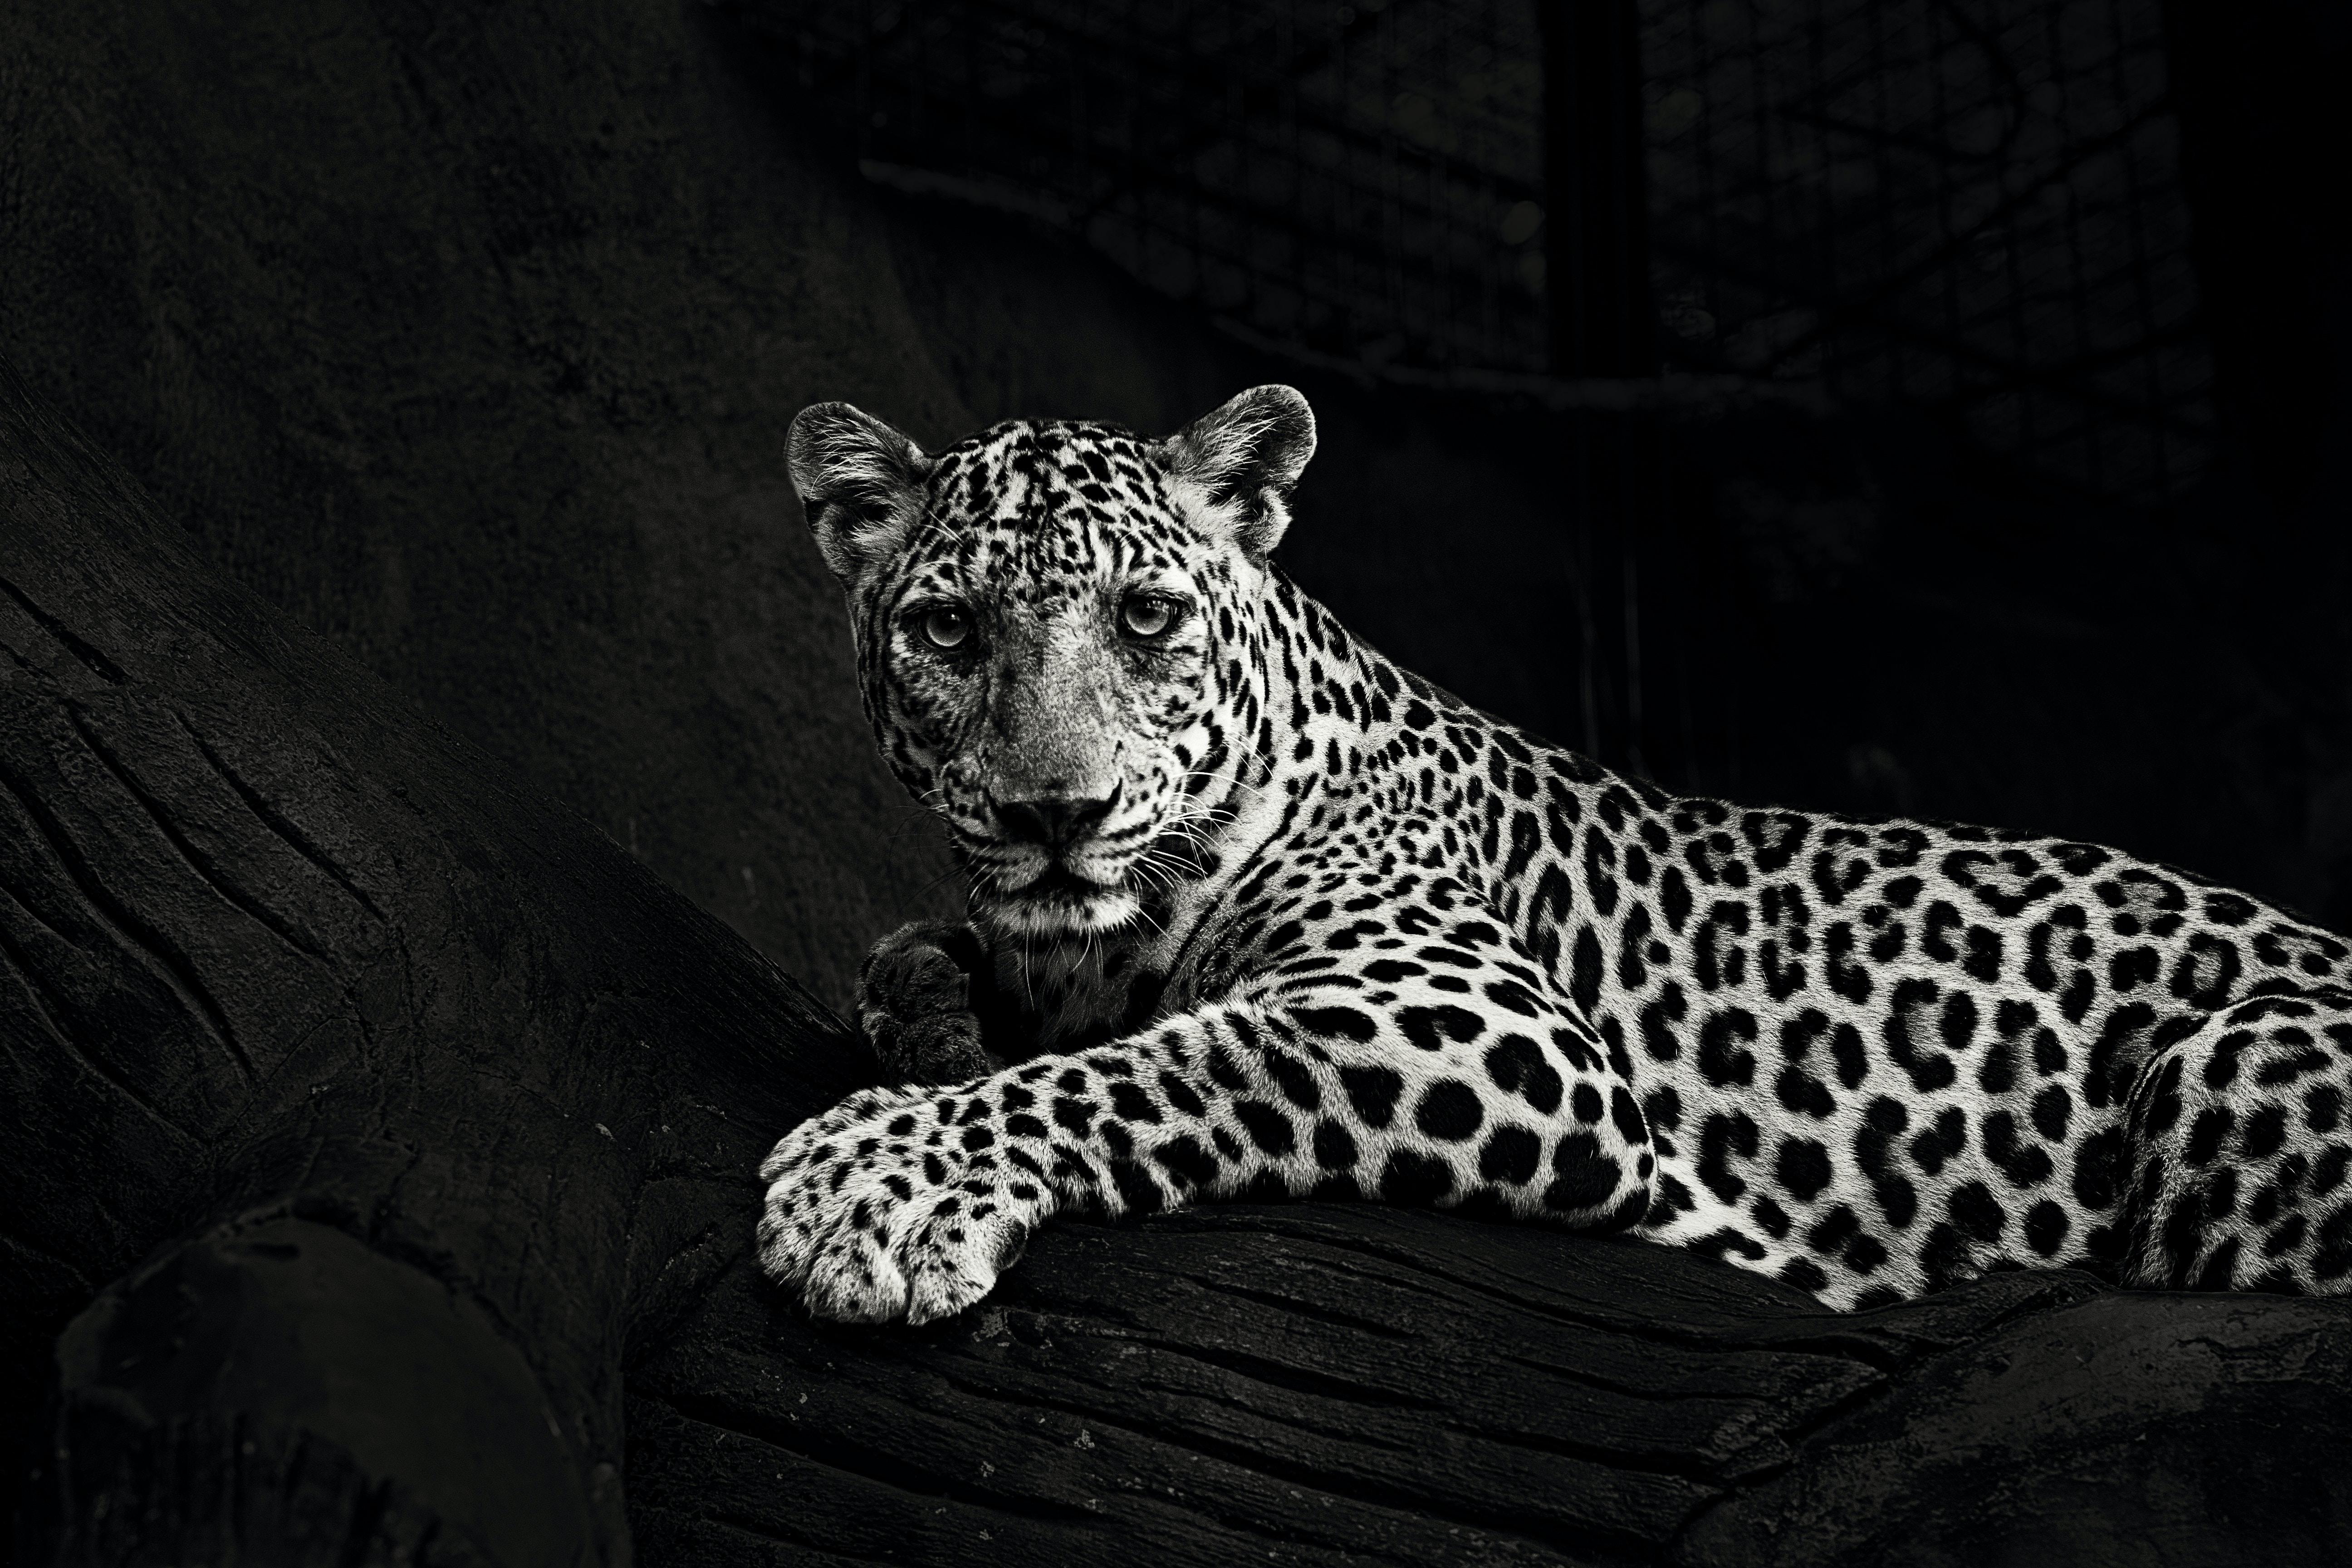 greyscale photo of lying leopard